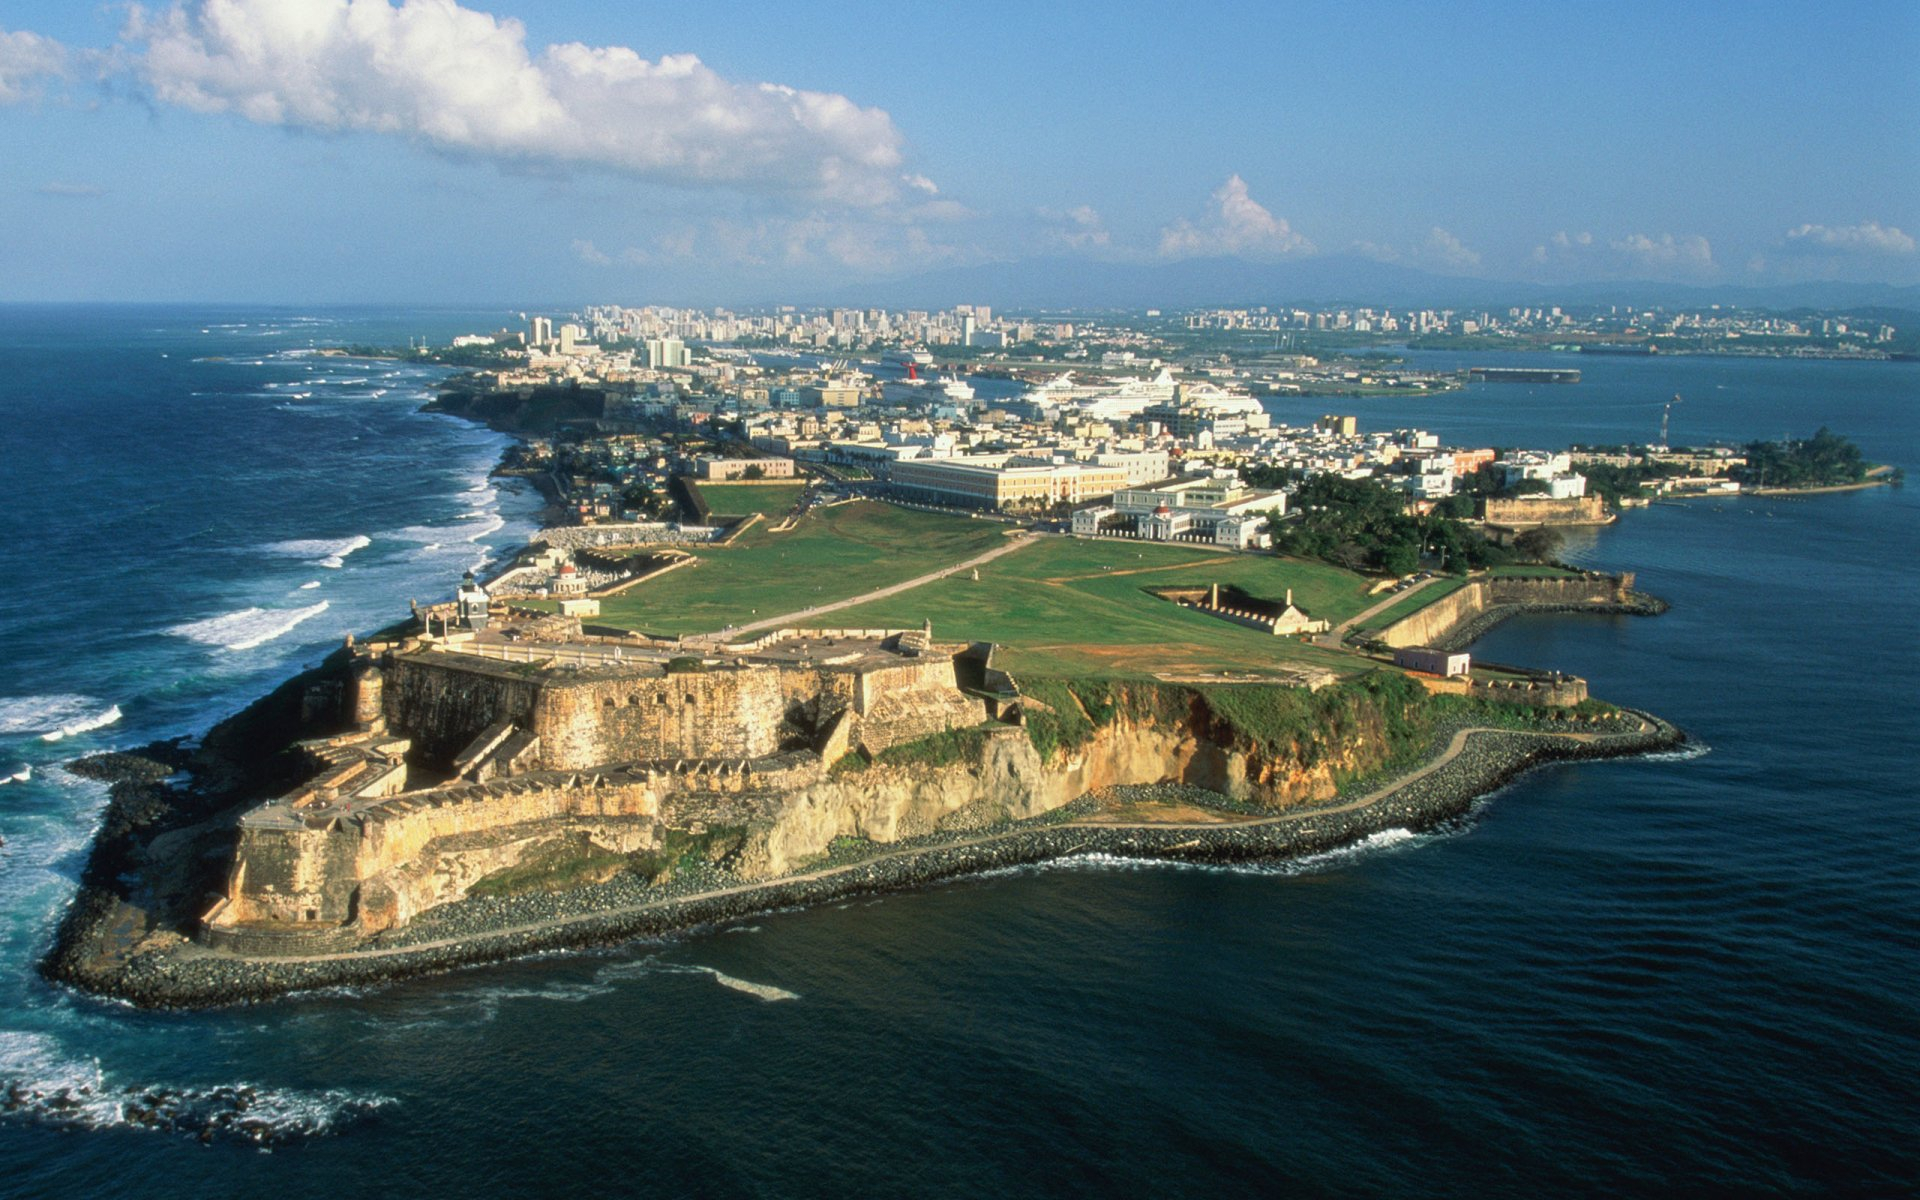 puerto rico hd wallpaper | hintergrund | 2560x1600 | id:614547